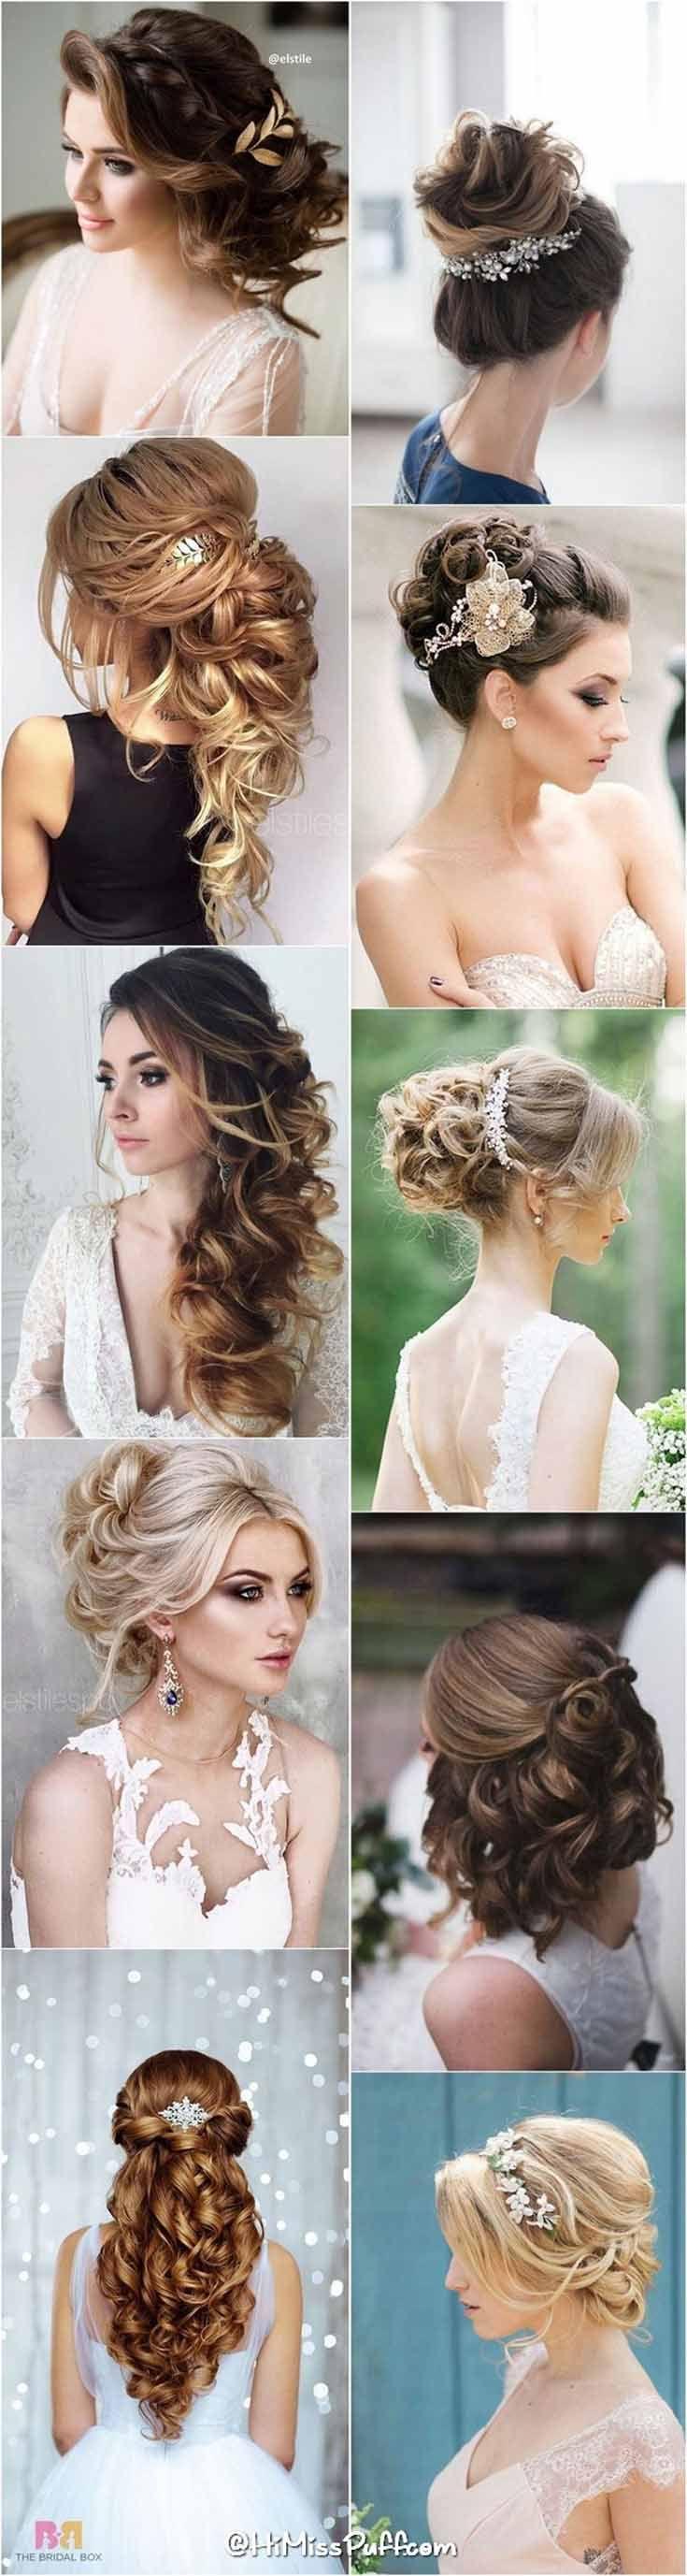 505 best Wedding Hair images on Pinterest